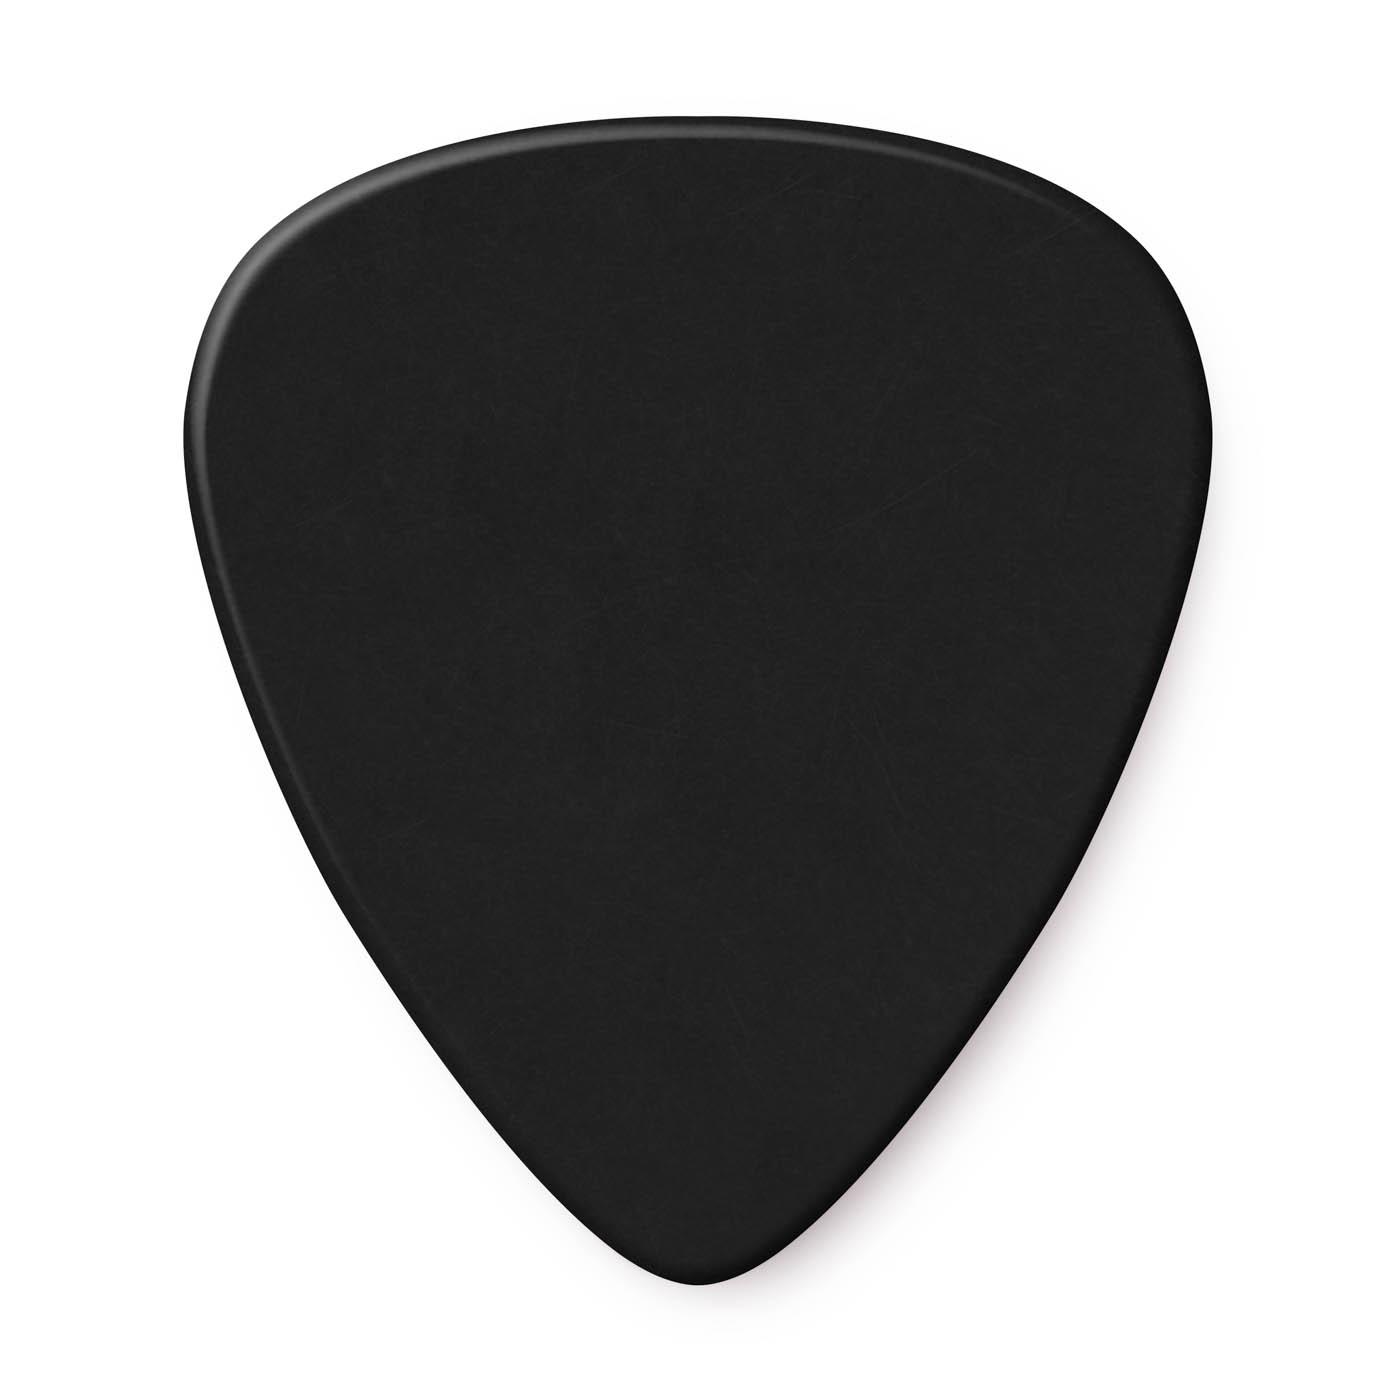 Dunlop - Black Classic heavy